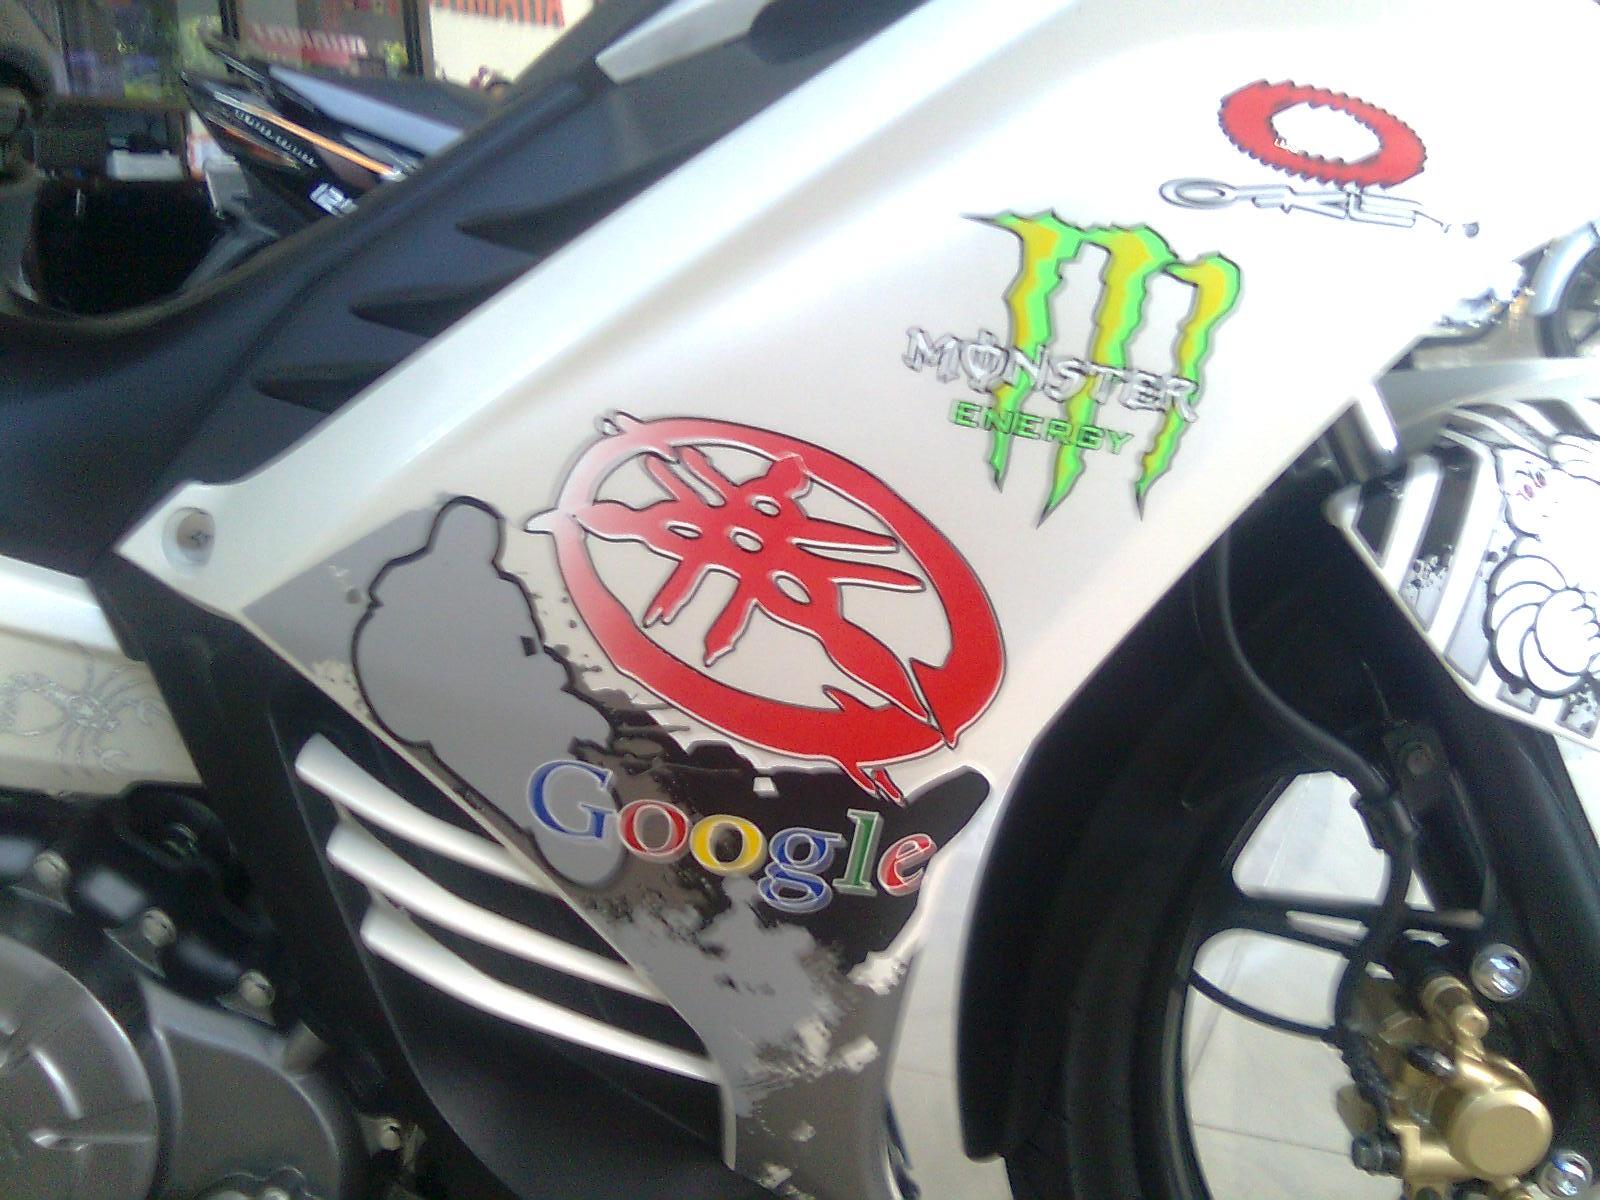 Bisa Juga Ya Dealer Yamaha Ngemodif Motor Keren Nih Coeey